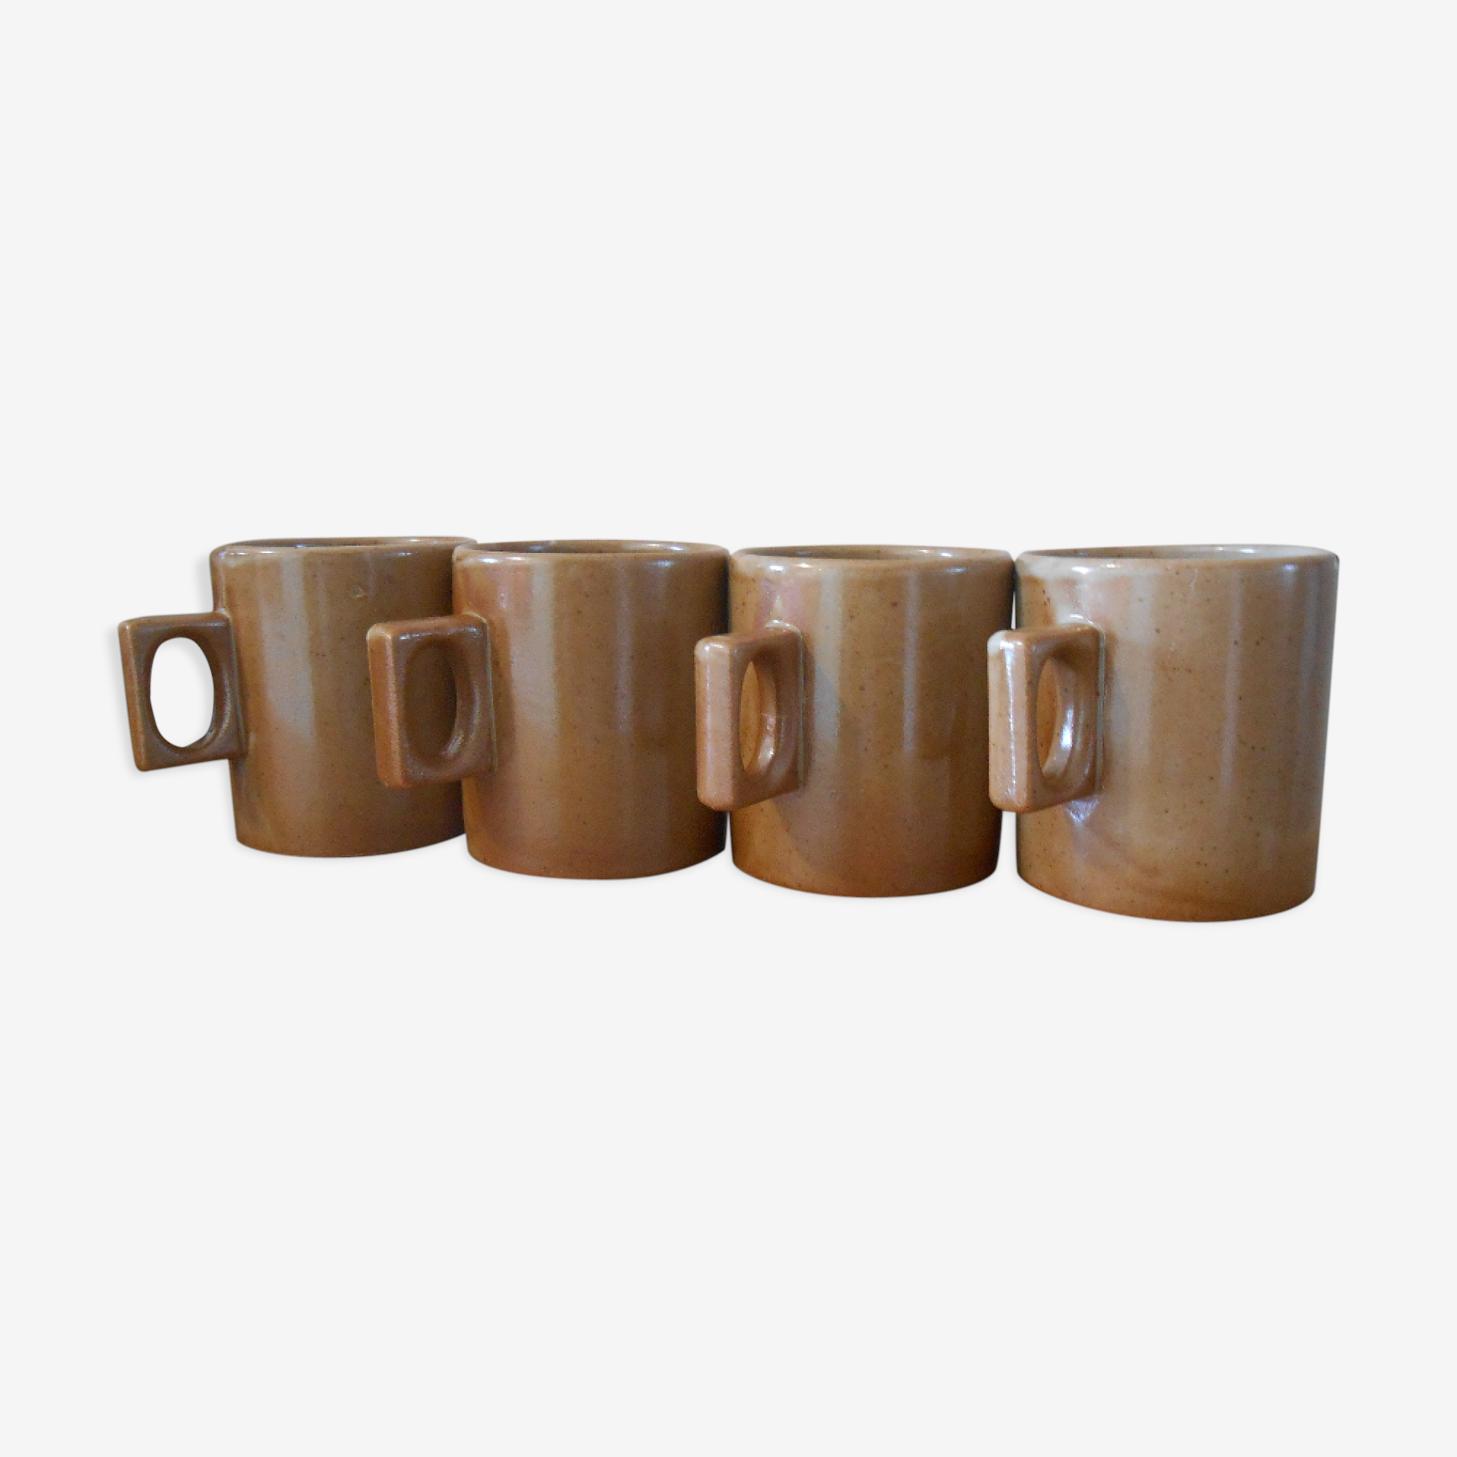 France sandstone, Brenne mugs